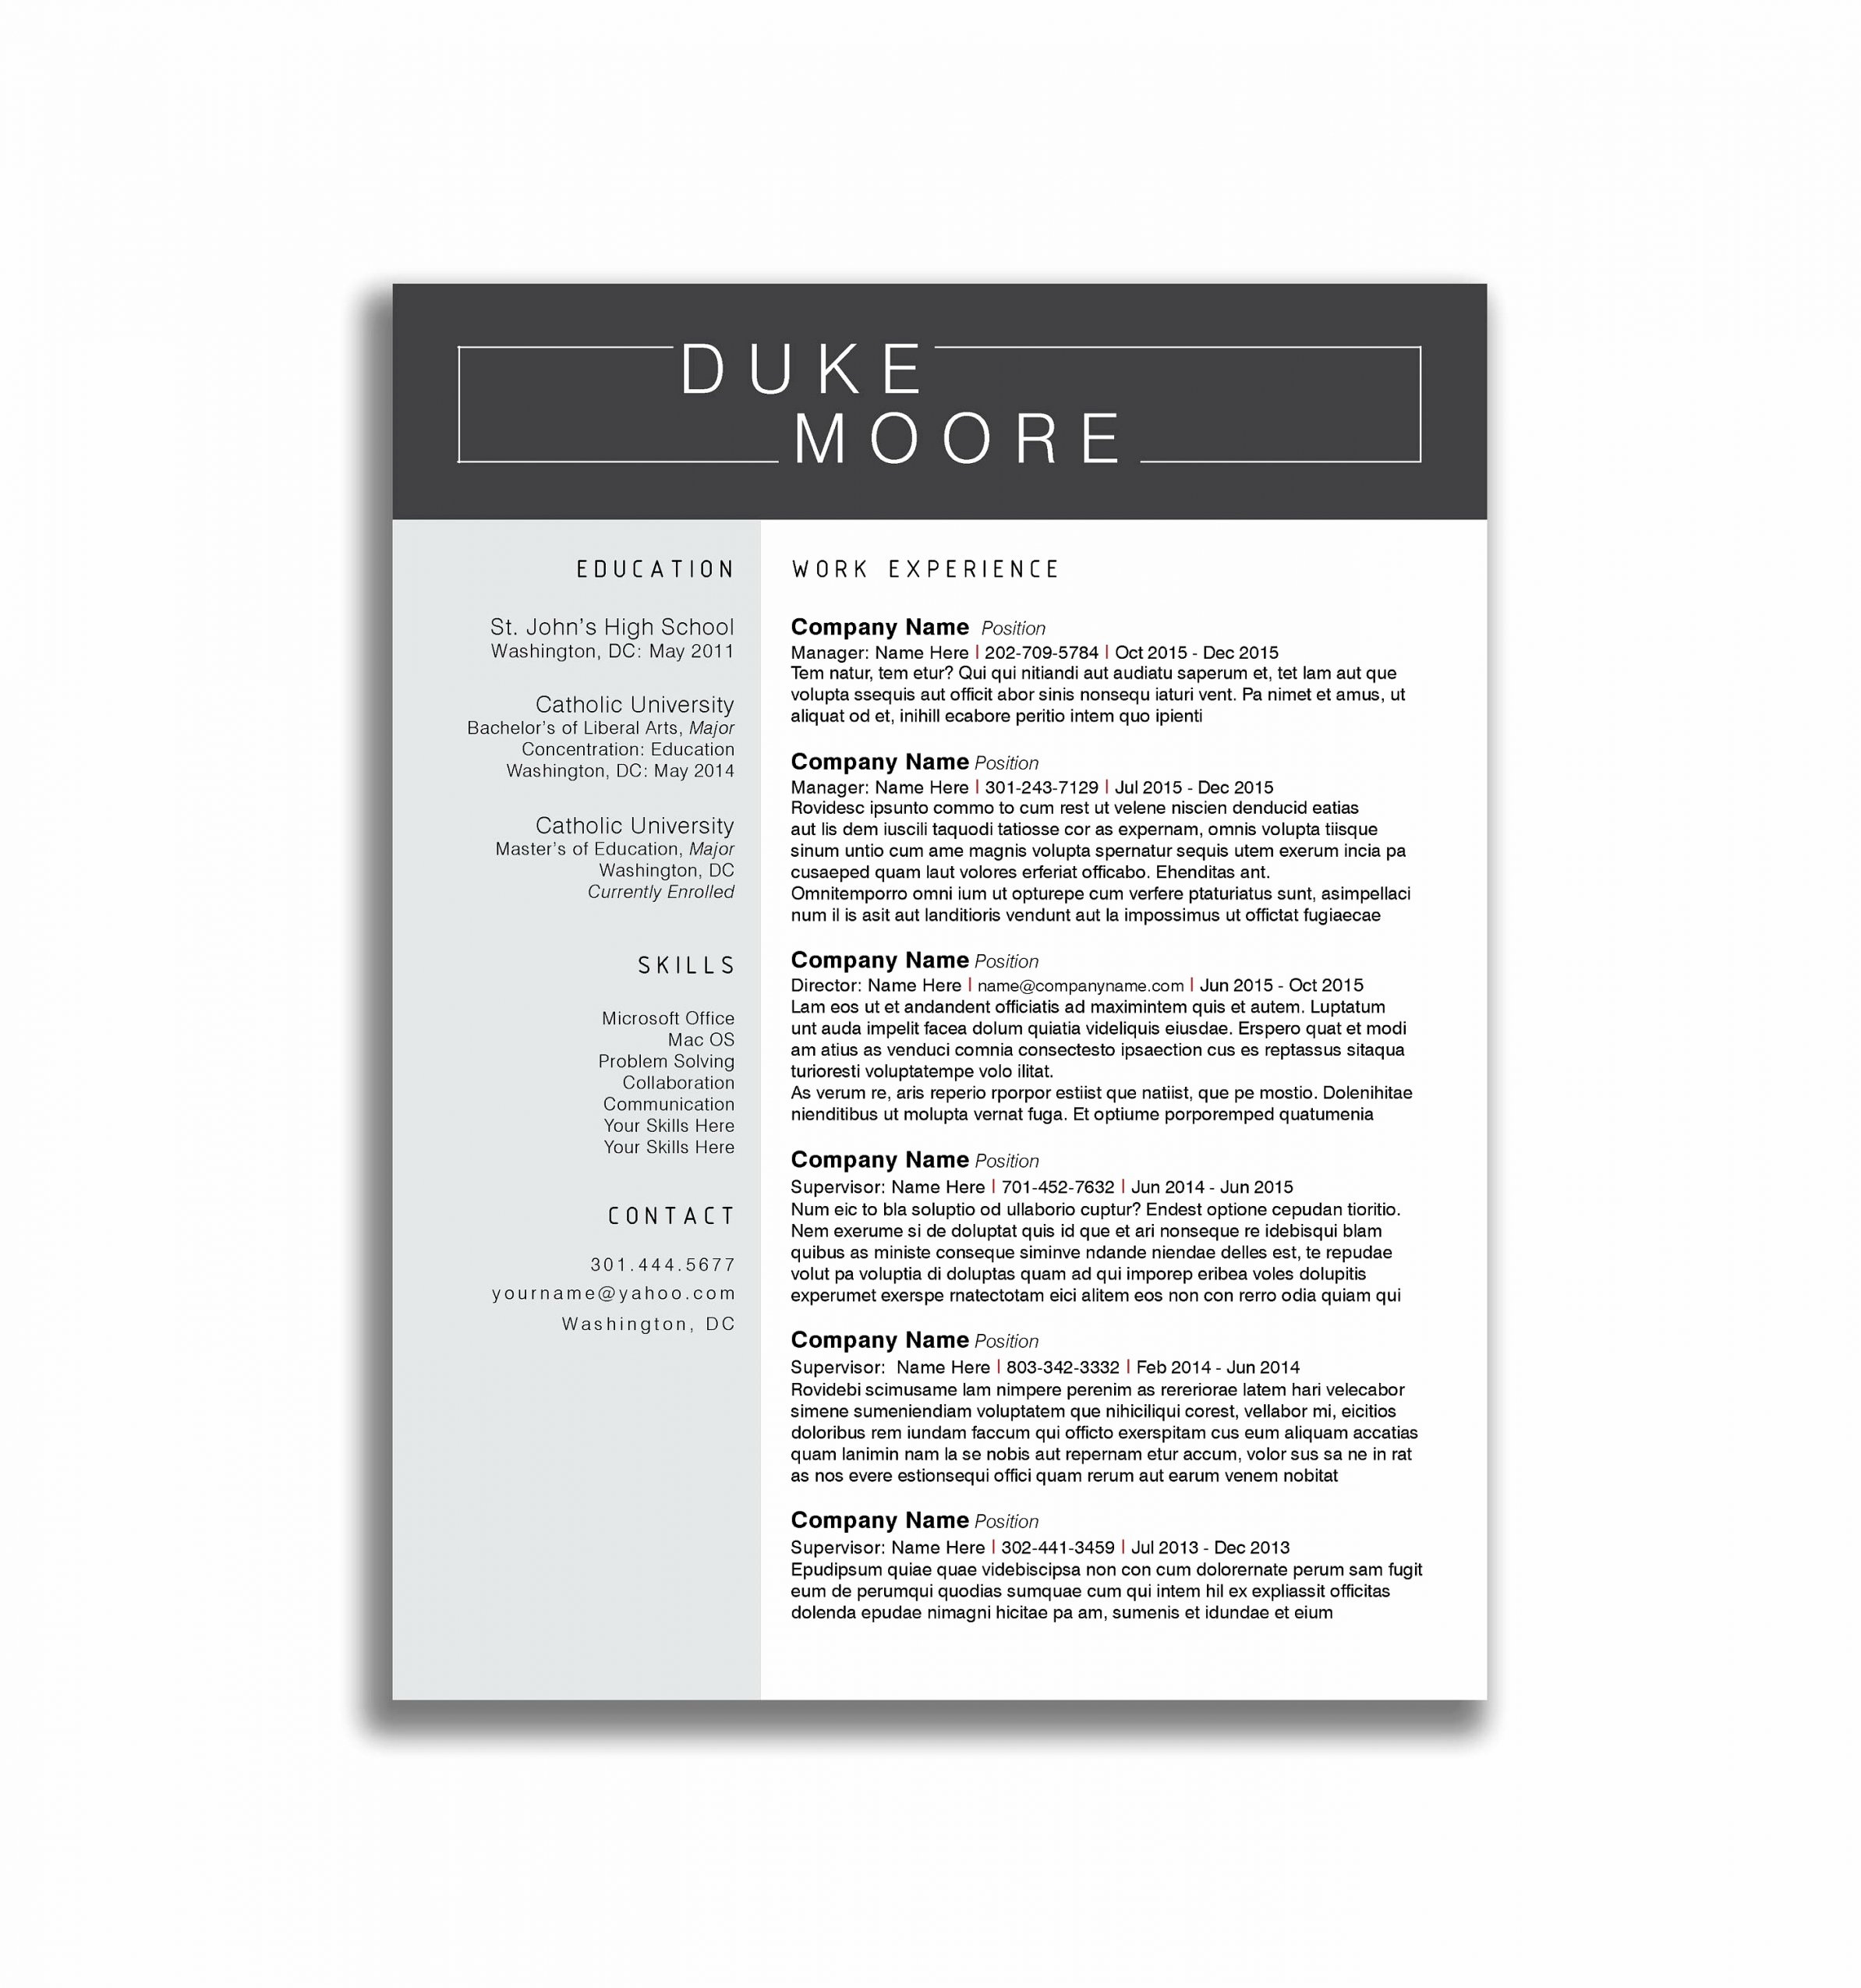 Resumespice Resume Writing Service Houston Tx